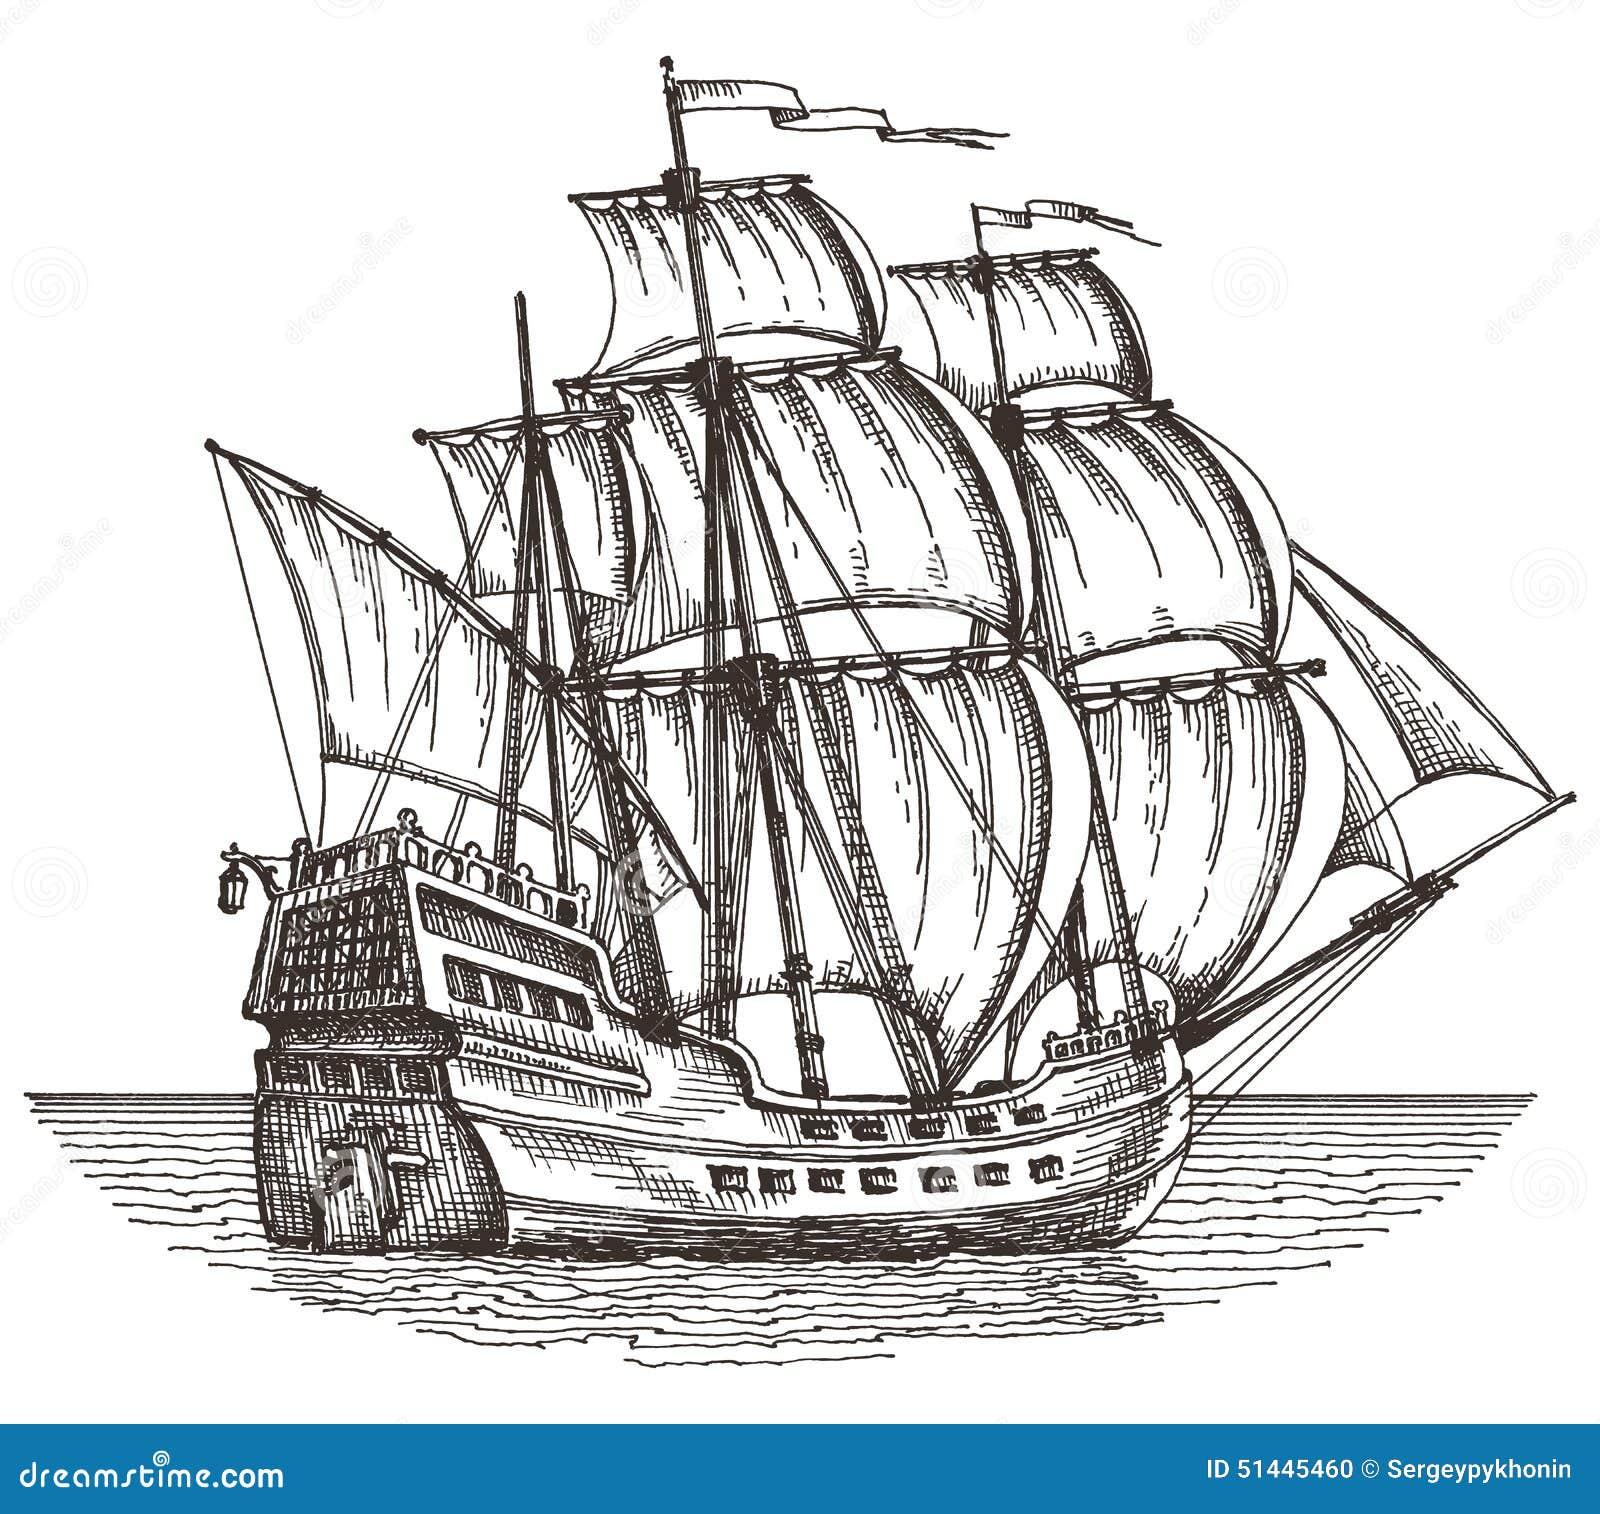 Ship On A White Background. Sketch. Illustration Stock